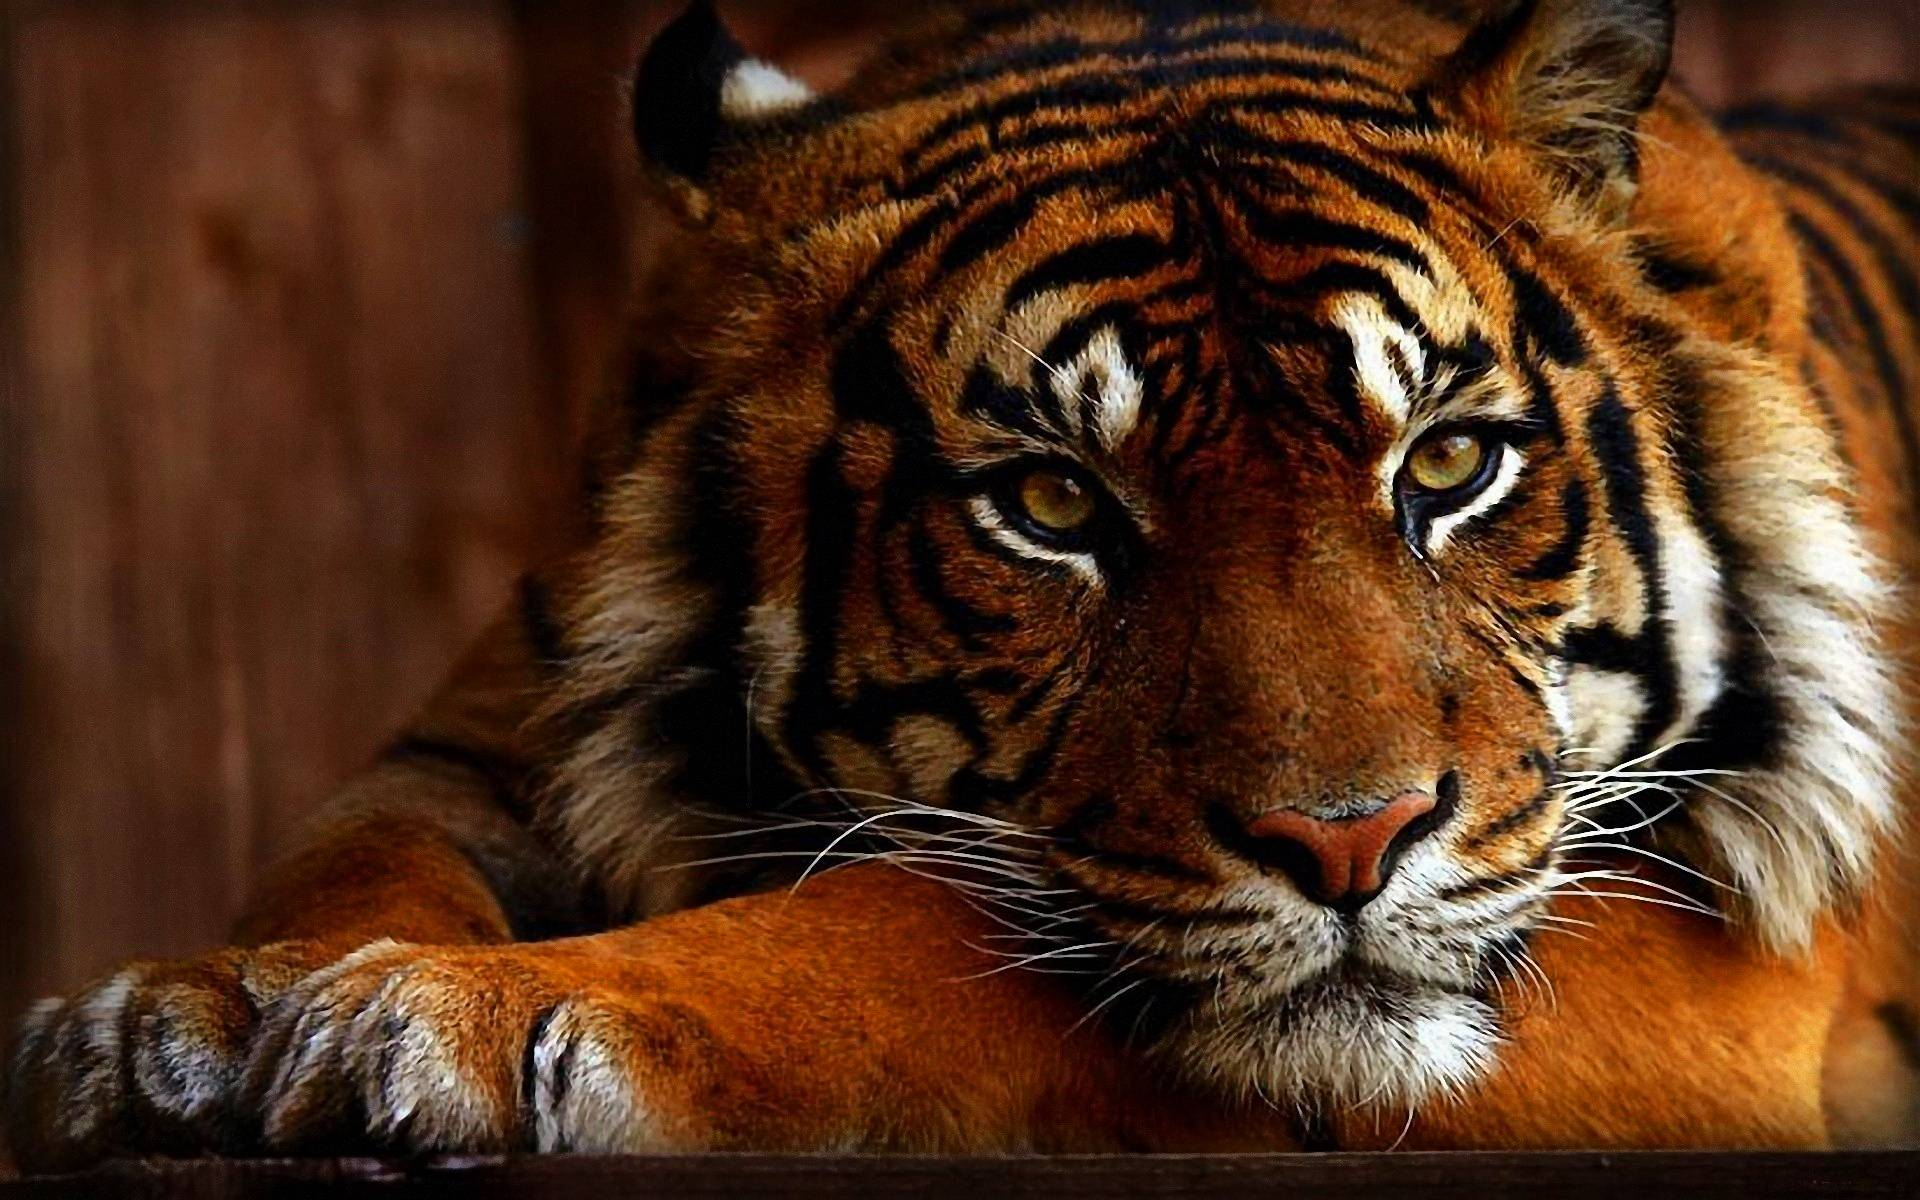 Wallpaper HD Tiger 73 172042 High Definition Wallpapers  wallalay.